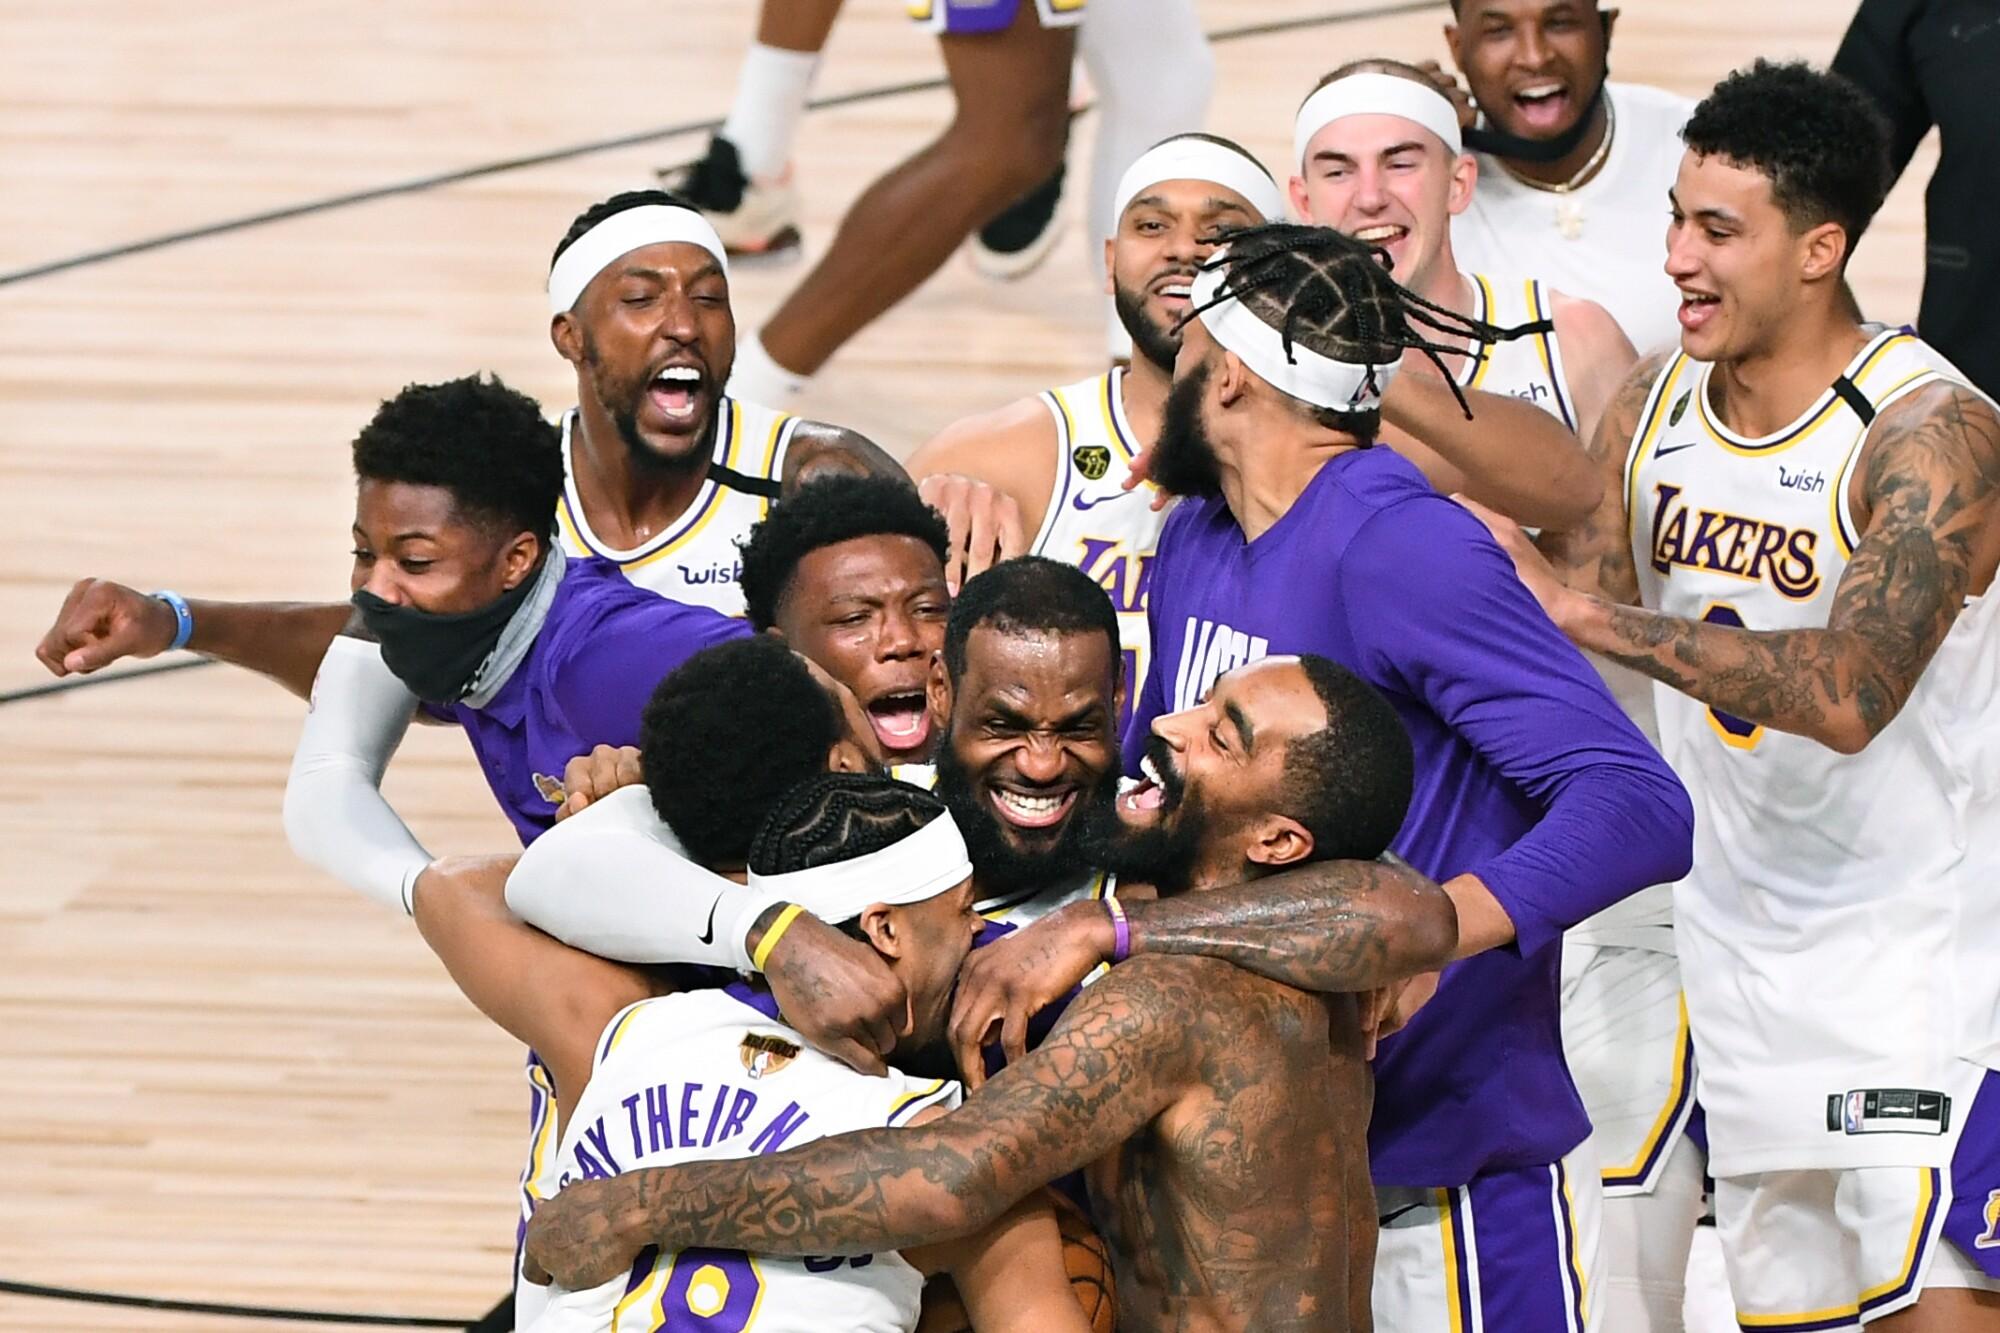 Laker players, including LeBron James, celebrate winning the NBA championship.